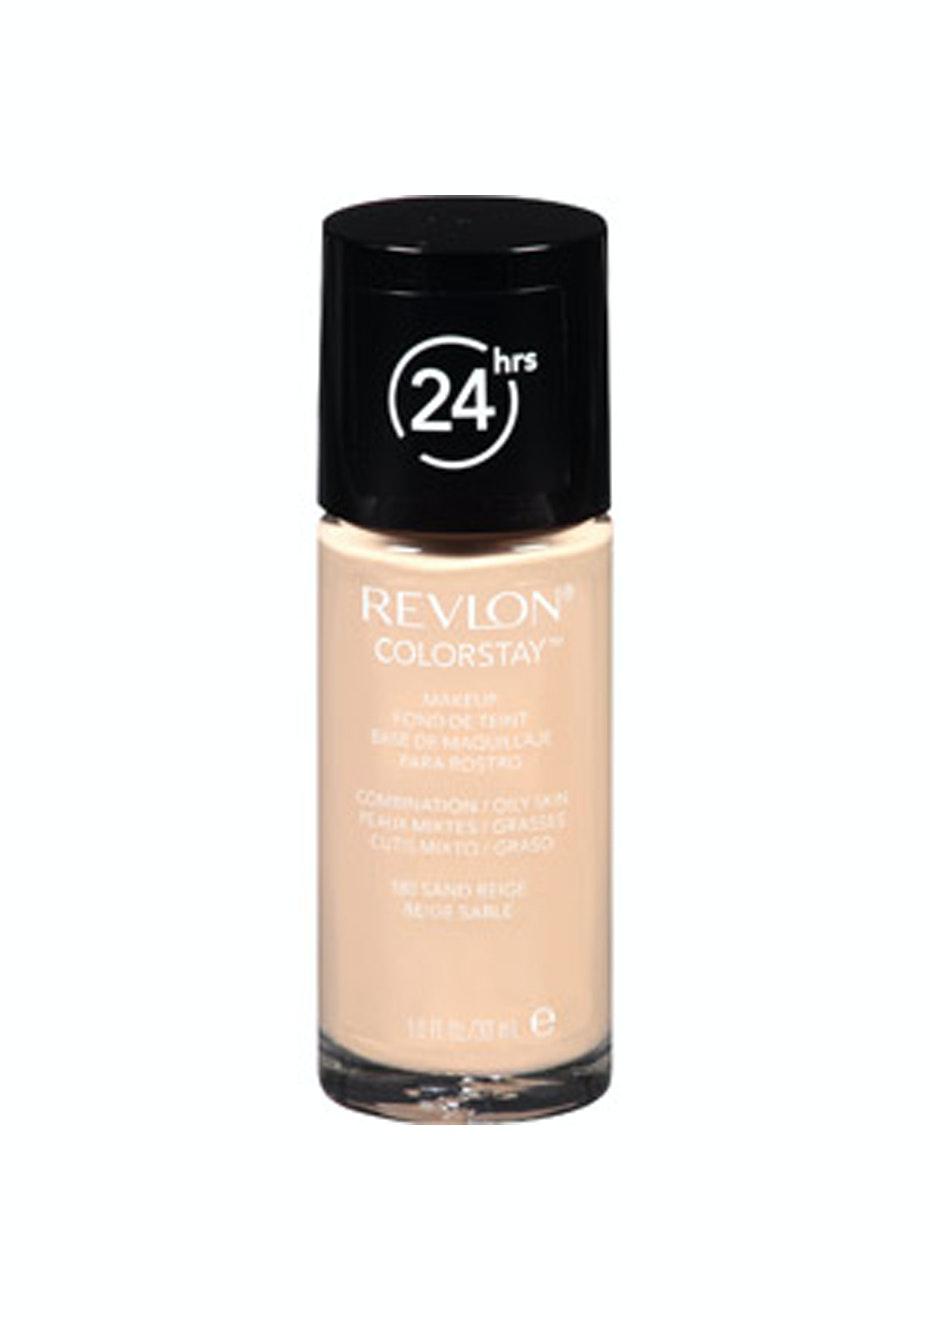 Revlon Colorstay 24hrs Liquid Makeup Combo/Oily 180 Sand Beige